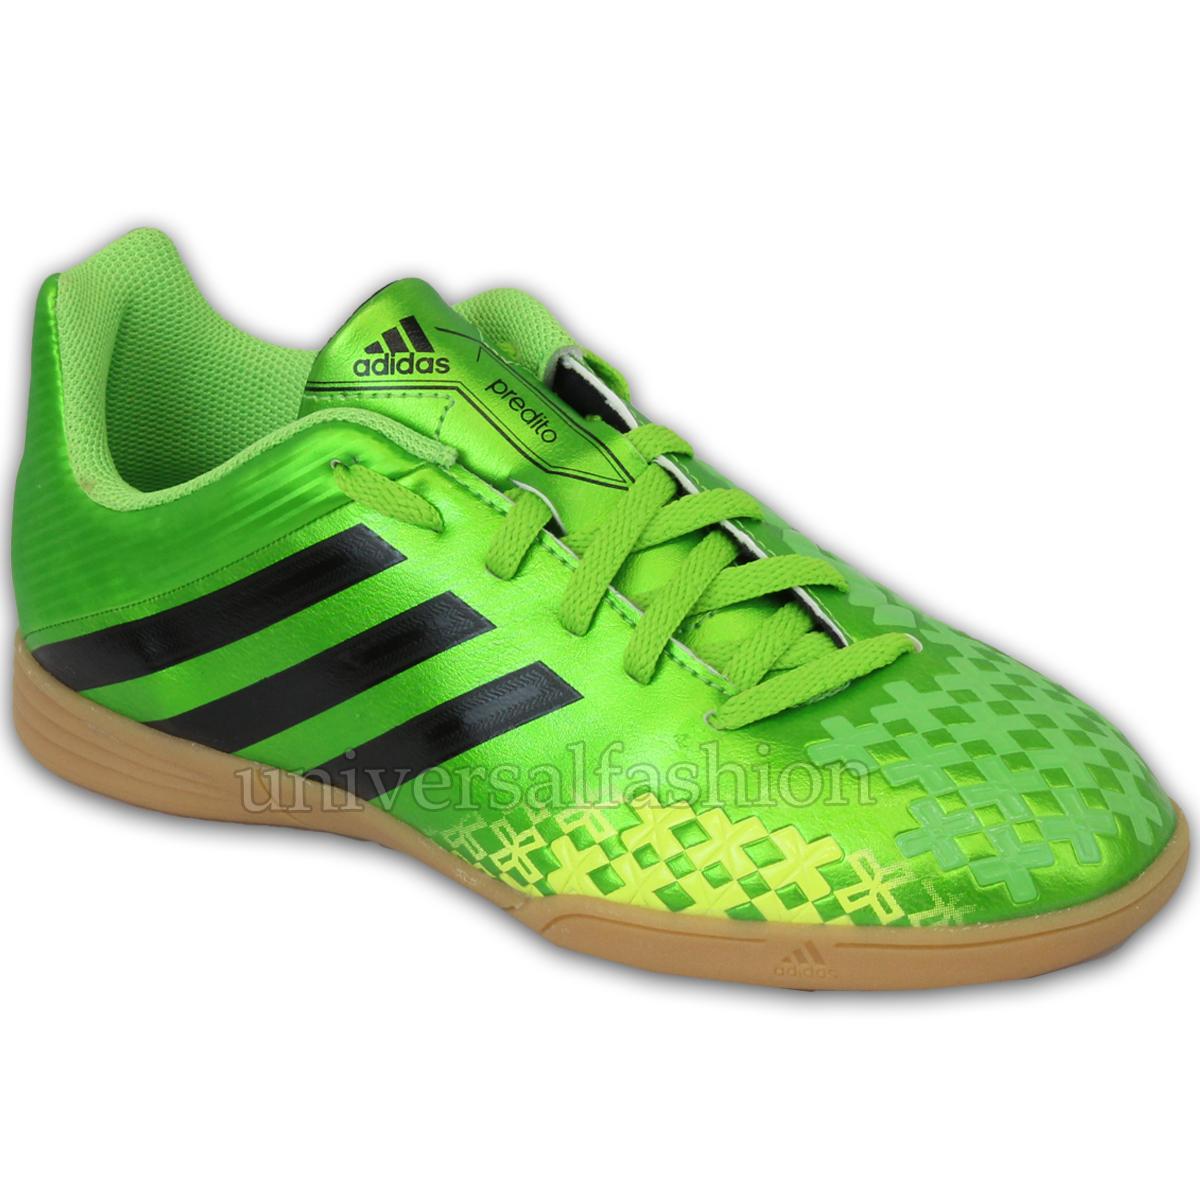 Adidas Soccer Kids Turf Shoes